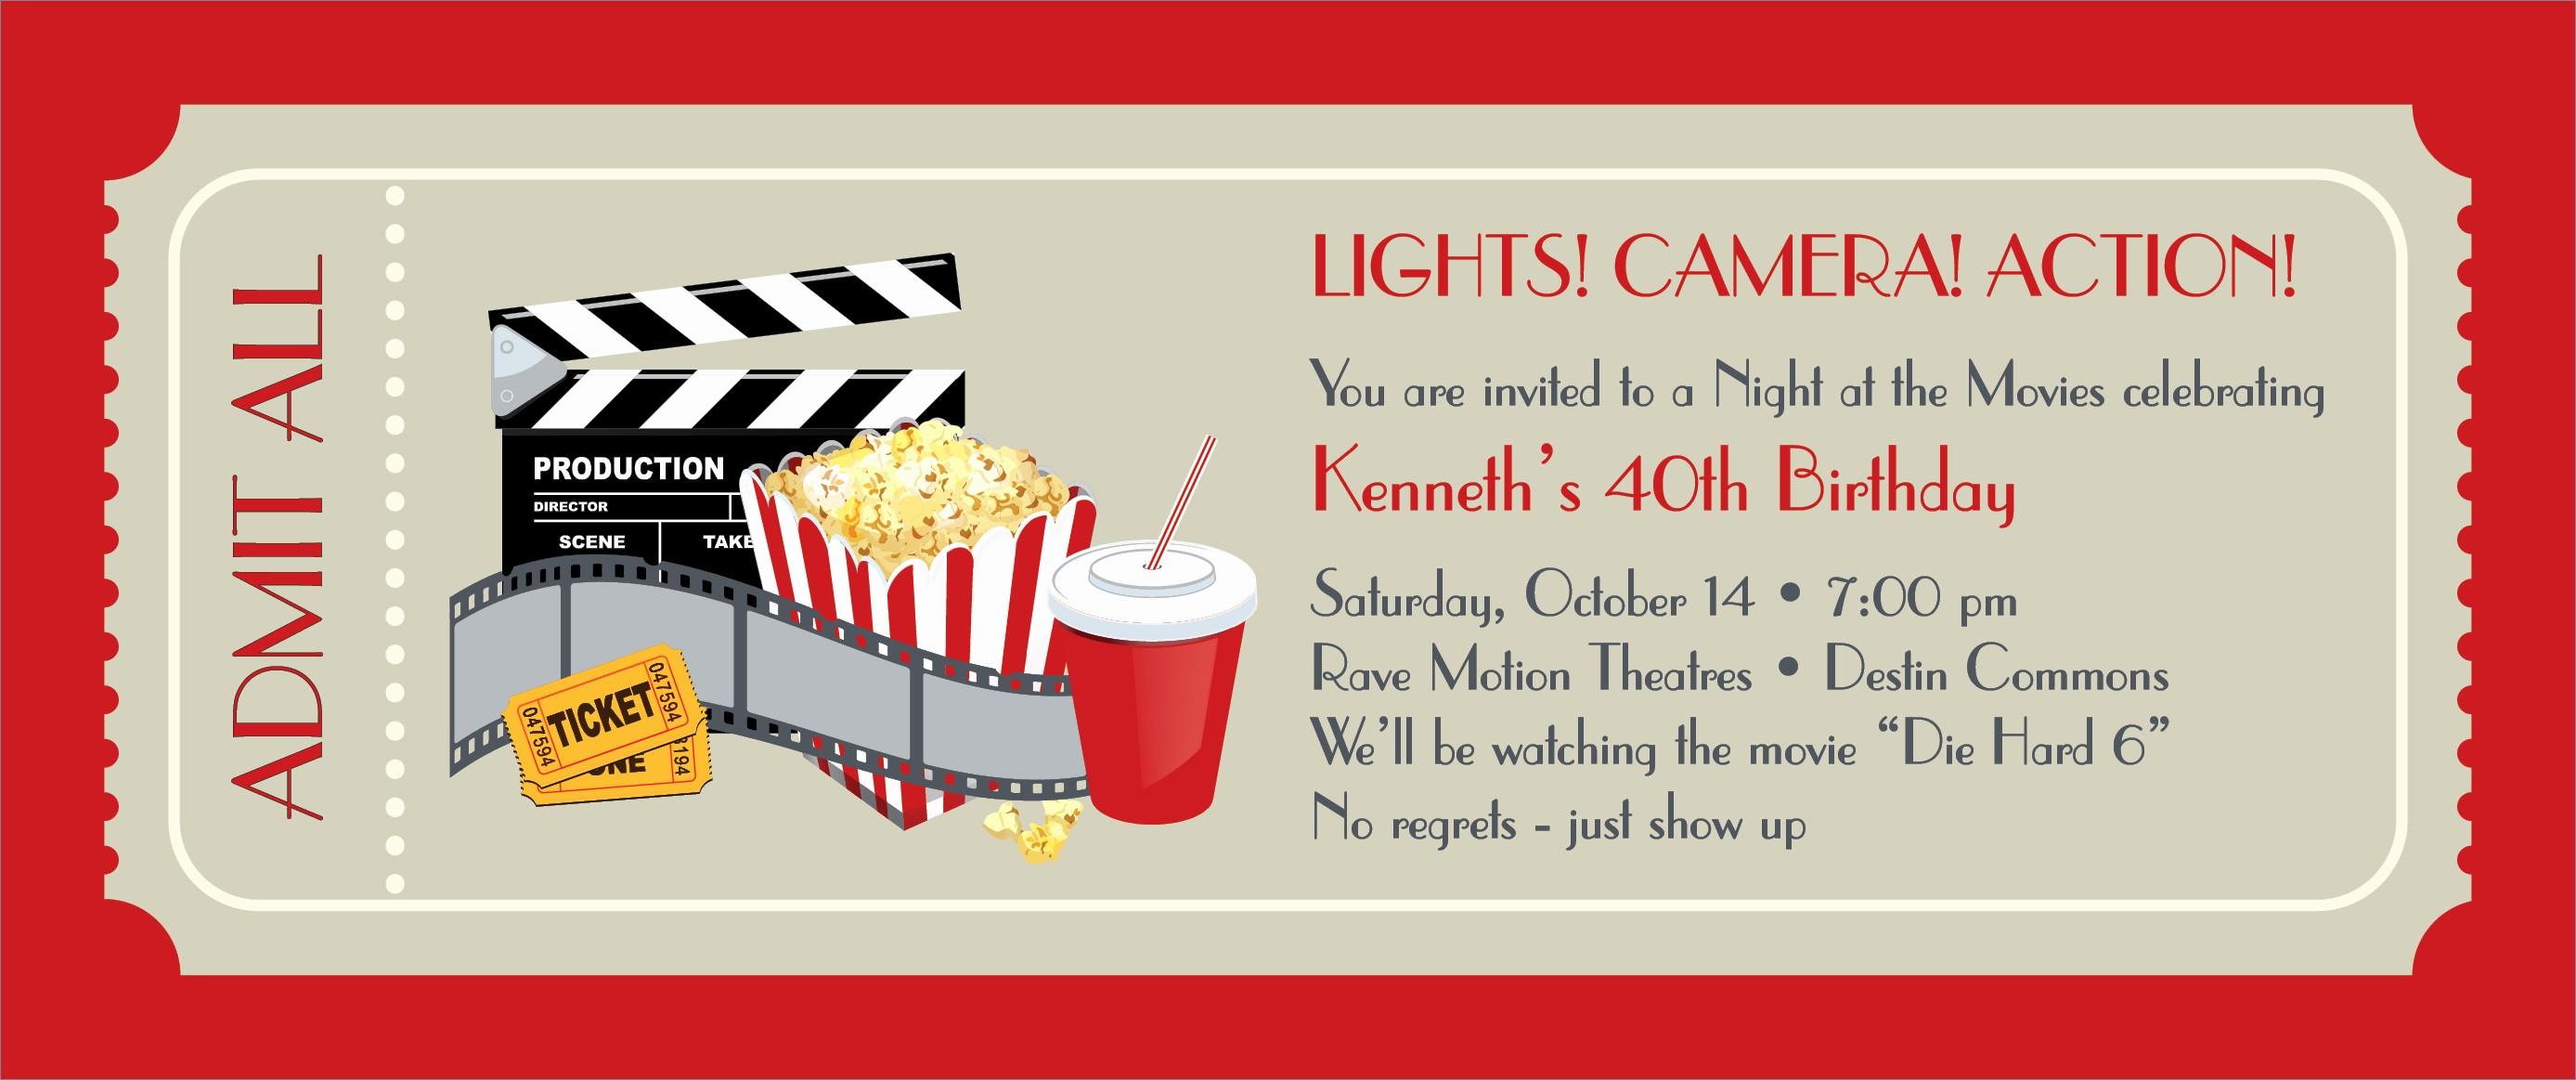 Free Printable Movie Tickets Template Luxury Movie Ticket Template